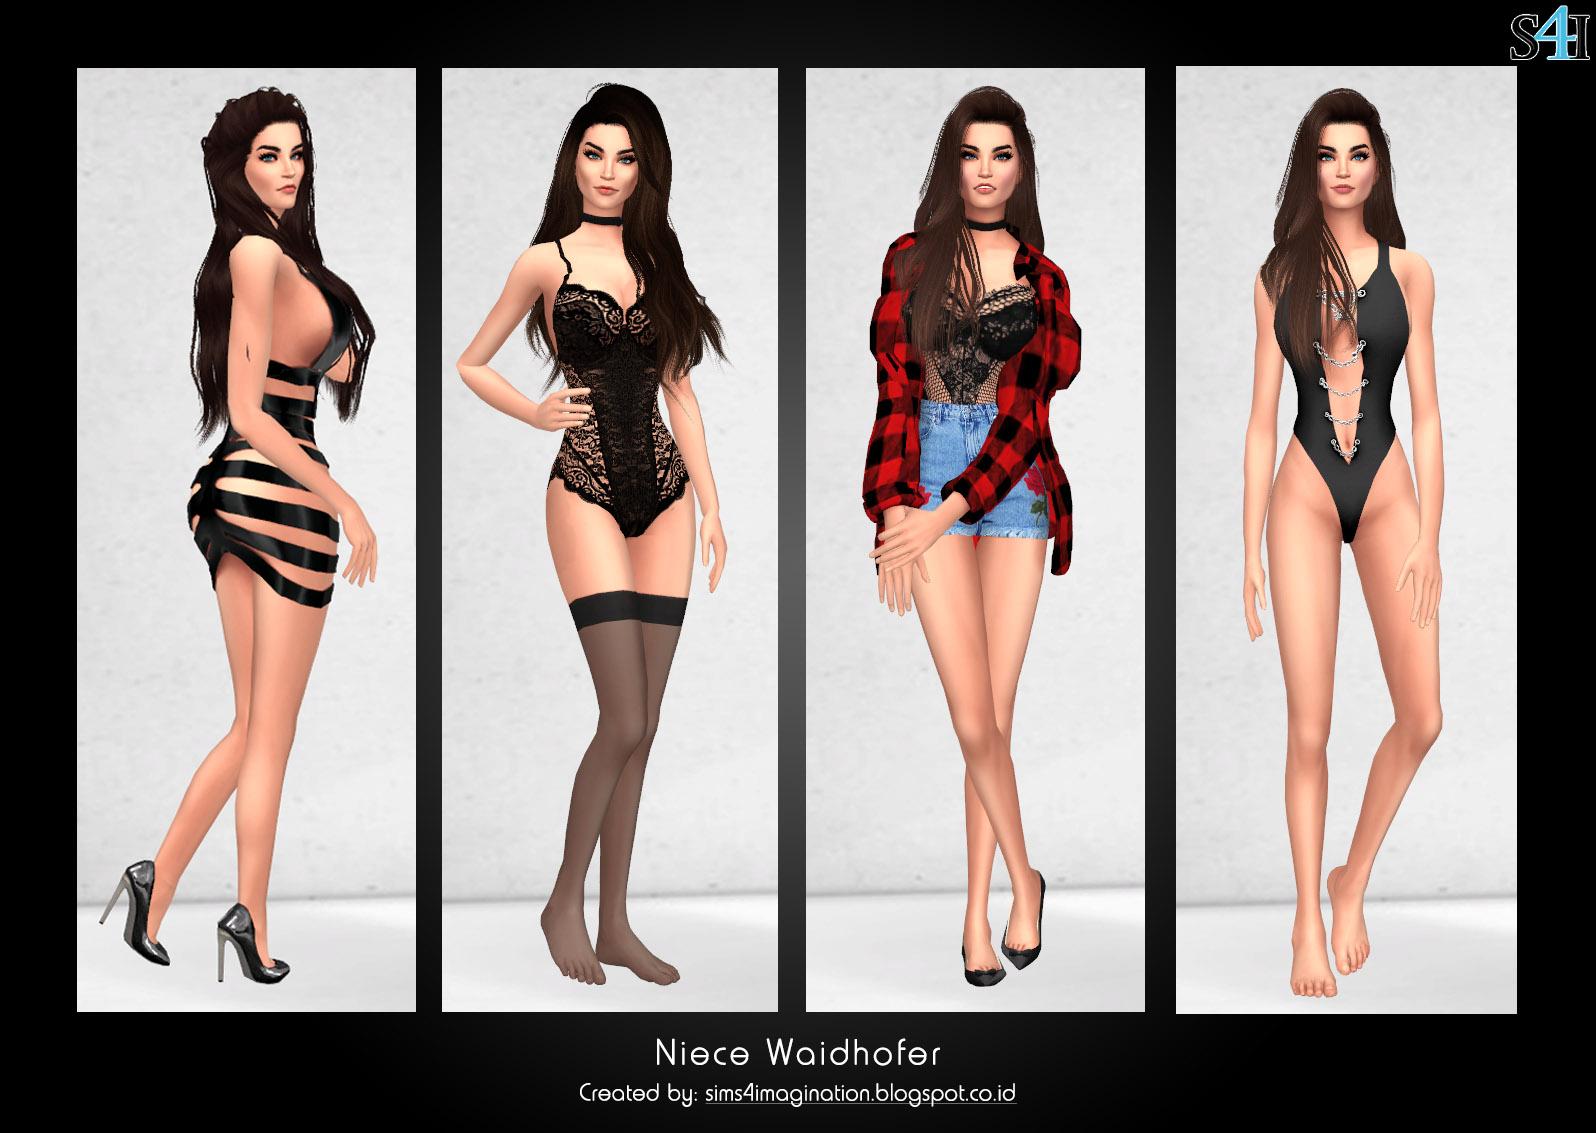 My Sims 4 CAS: Niece Waidhofer (Patreon) - Imagination Sims 4 CAS